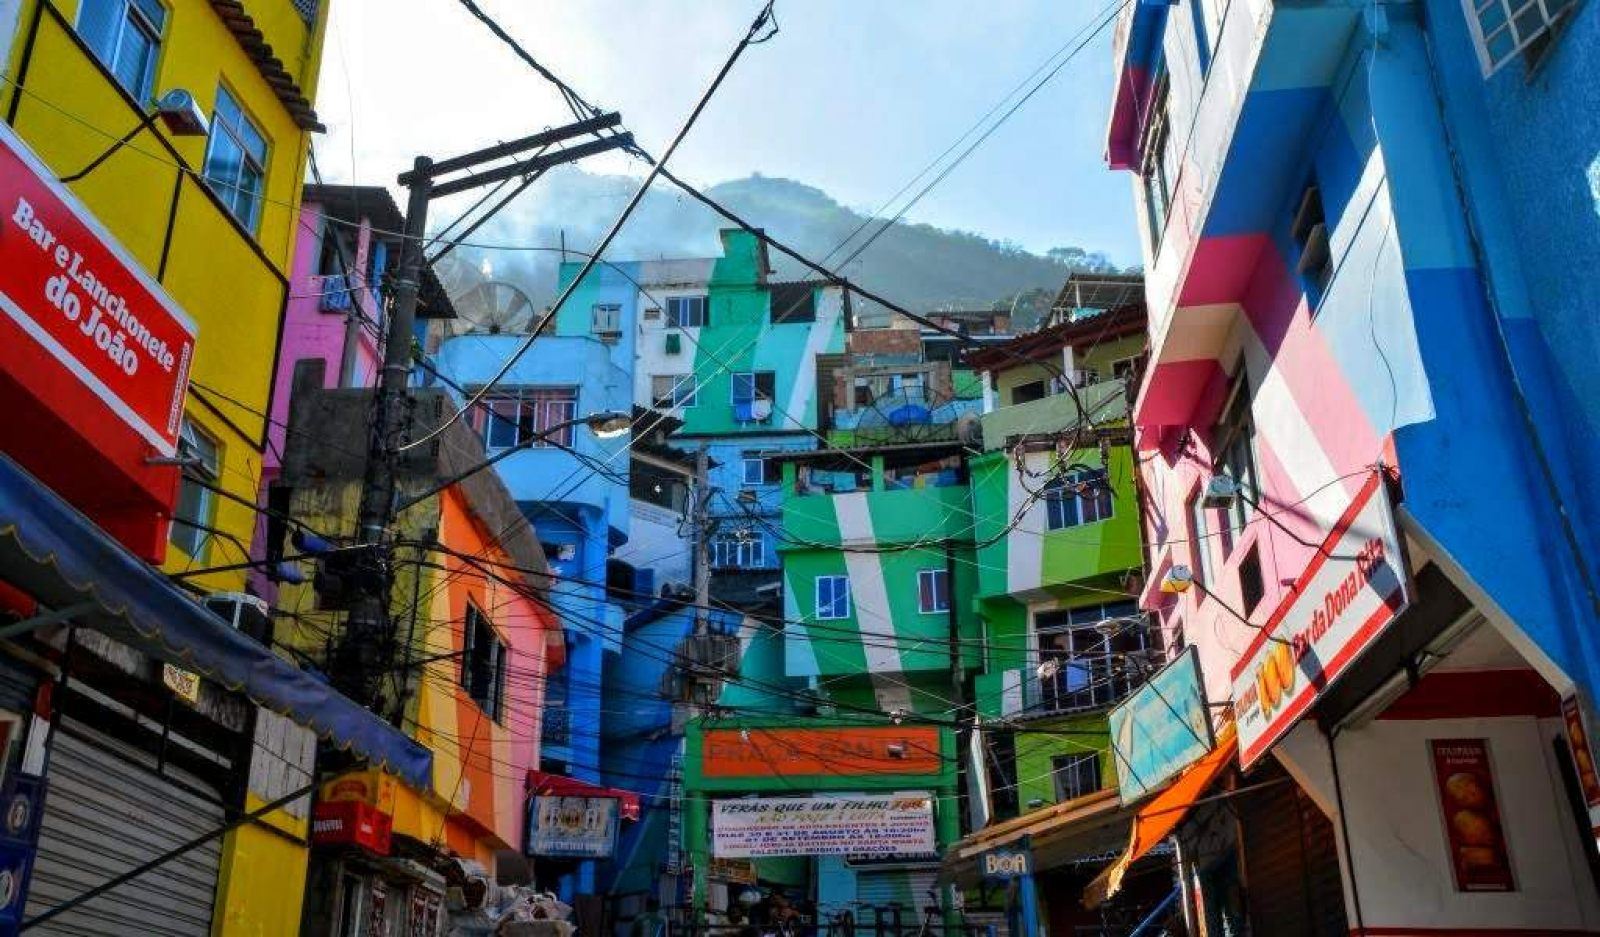 Hibiscus & Nomada : - - Favela Painting